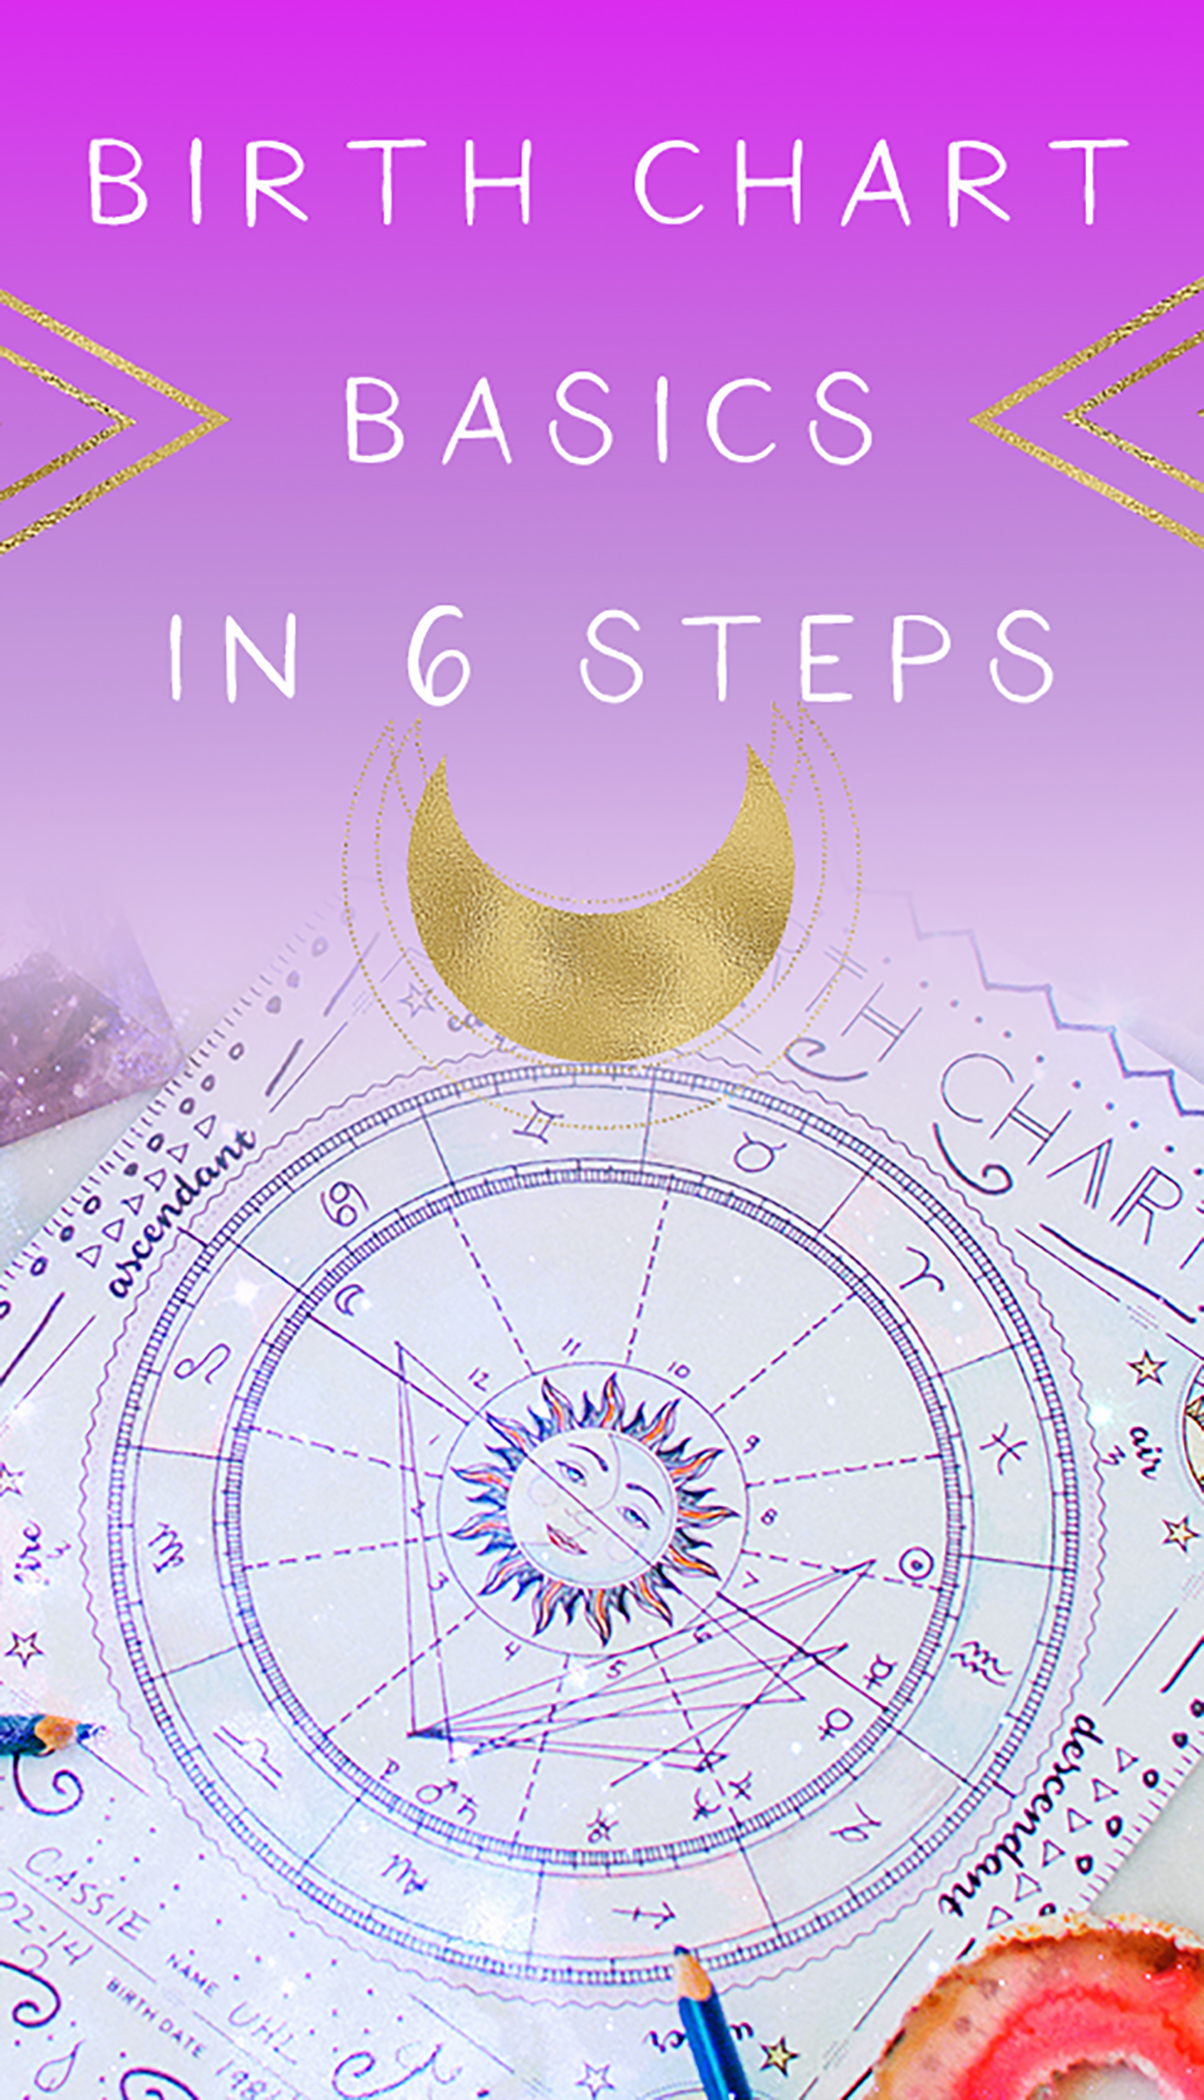 birth chart basics in 6 steps